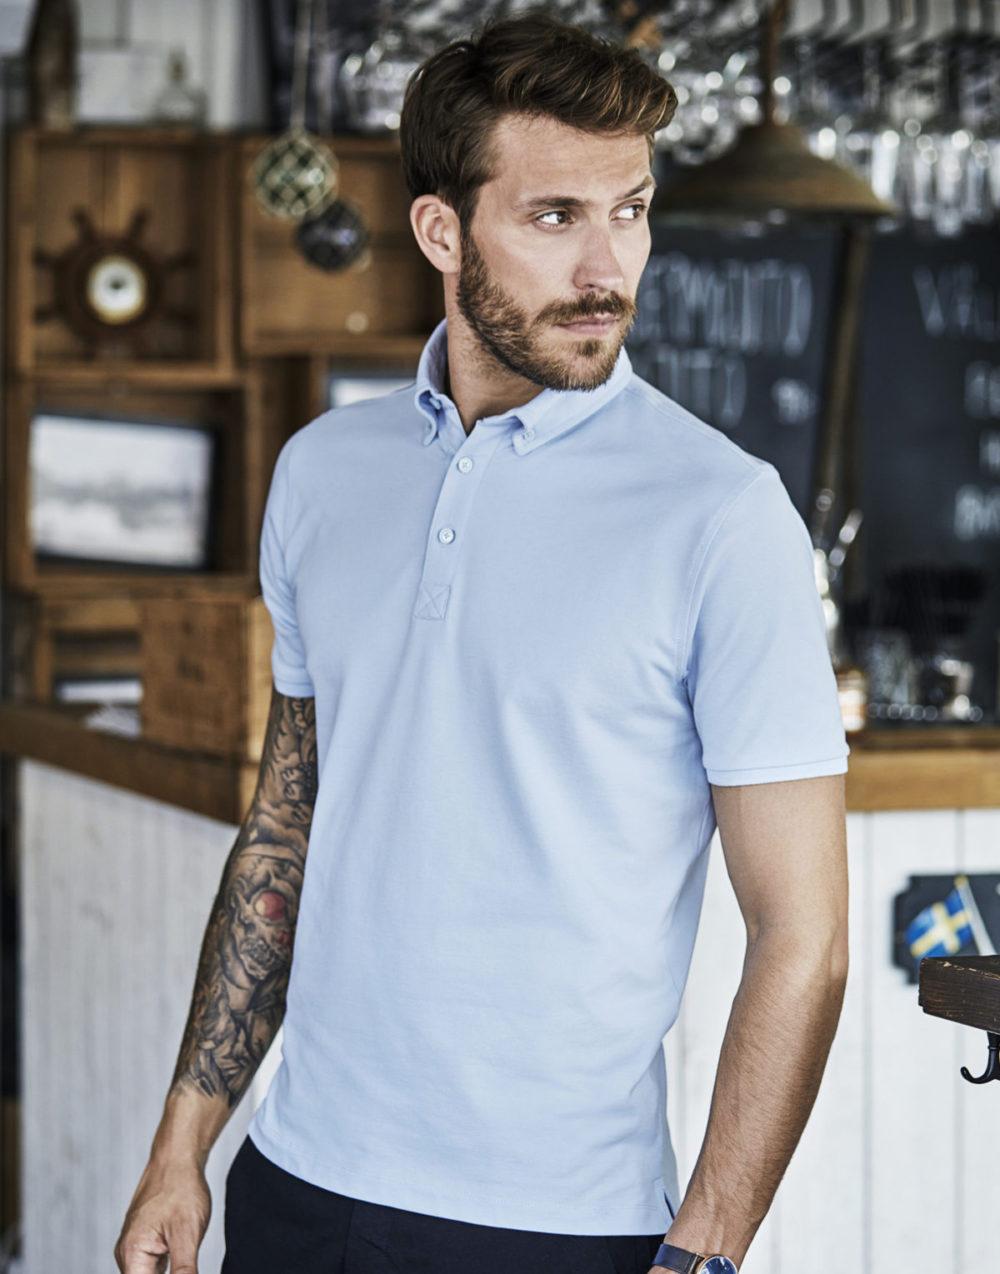 509.54 Fashion Luxury Stretch Polo 1410 Tee Jays Pasprint Antwepen Druktechnieken